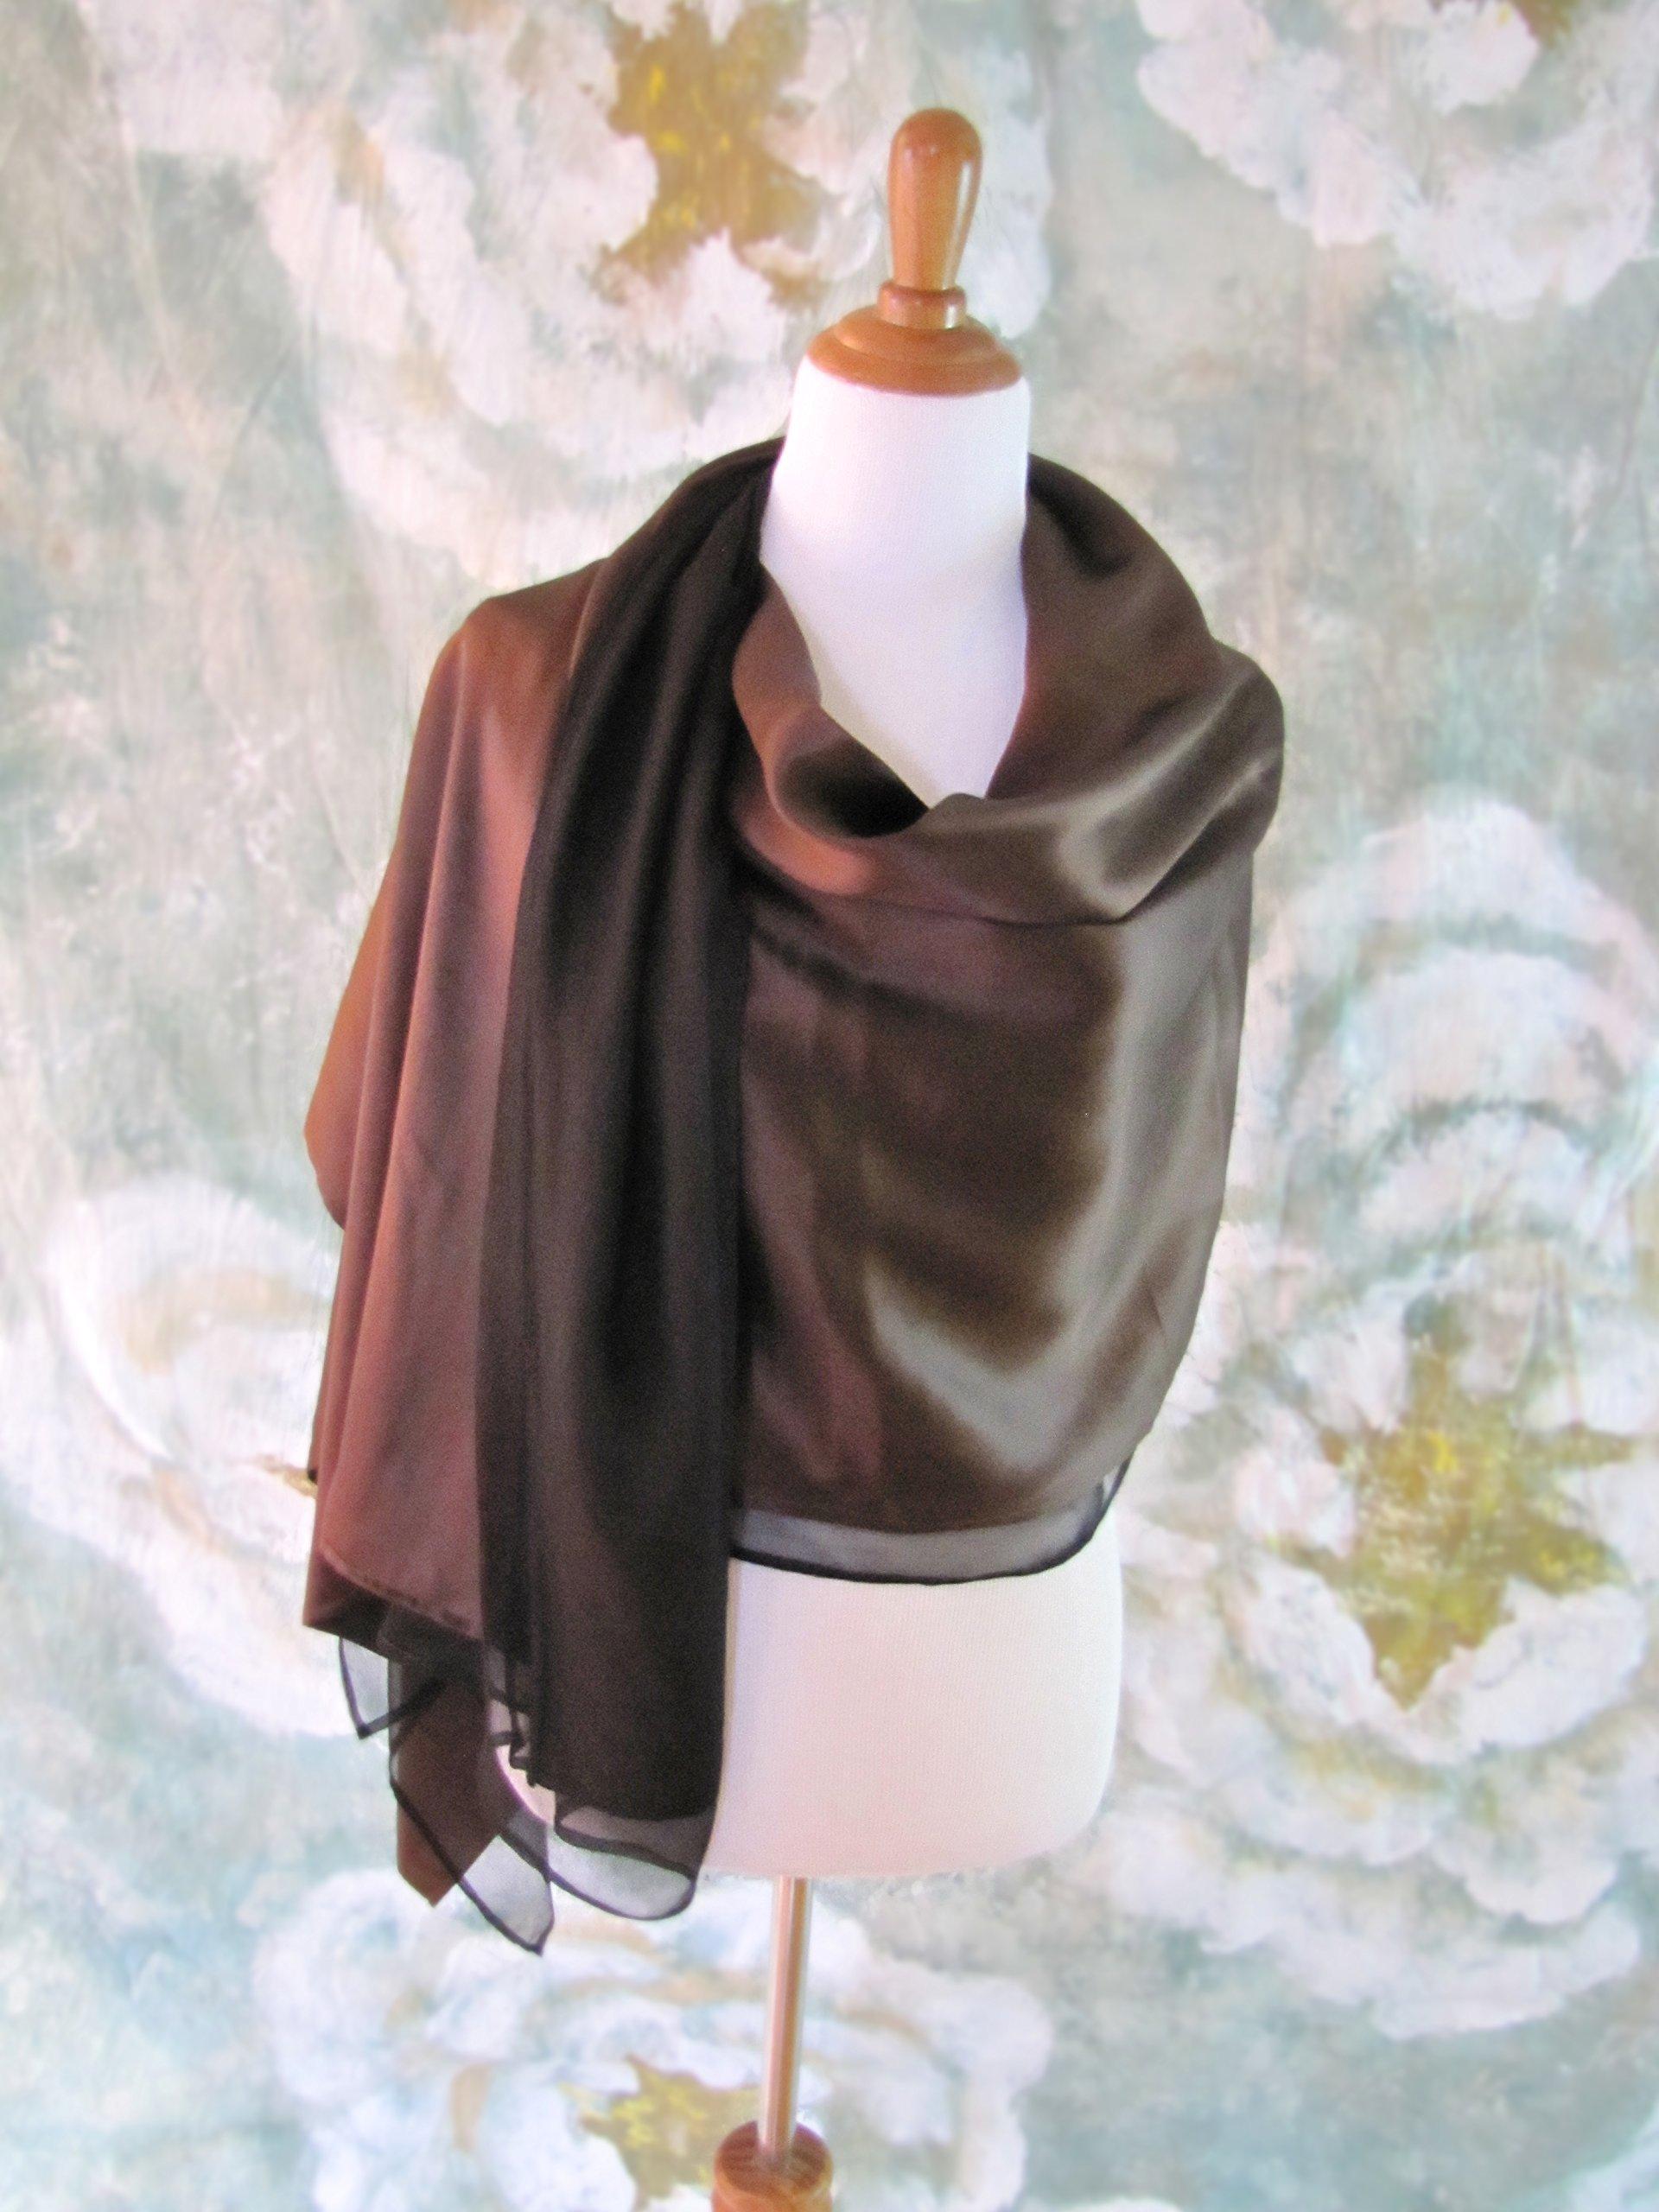 Silk Evening Wrap, Silk Shawl, Two-tone Chocolate and Black, Oversized Silk Scarf, Evening Shawl, Handmade